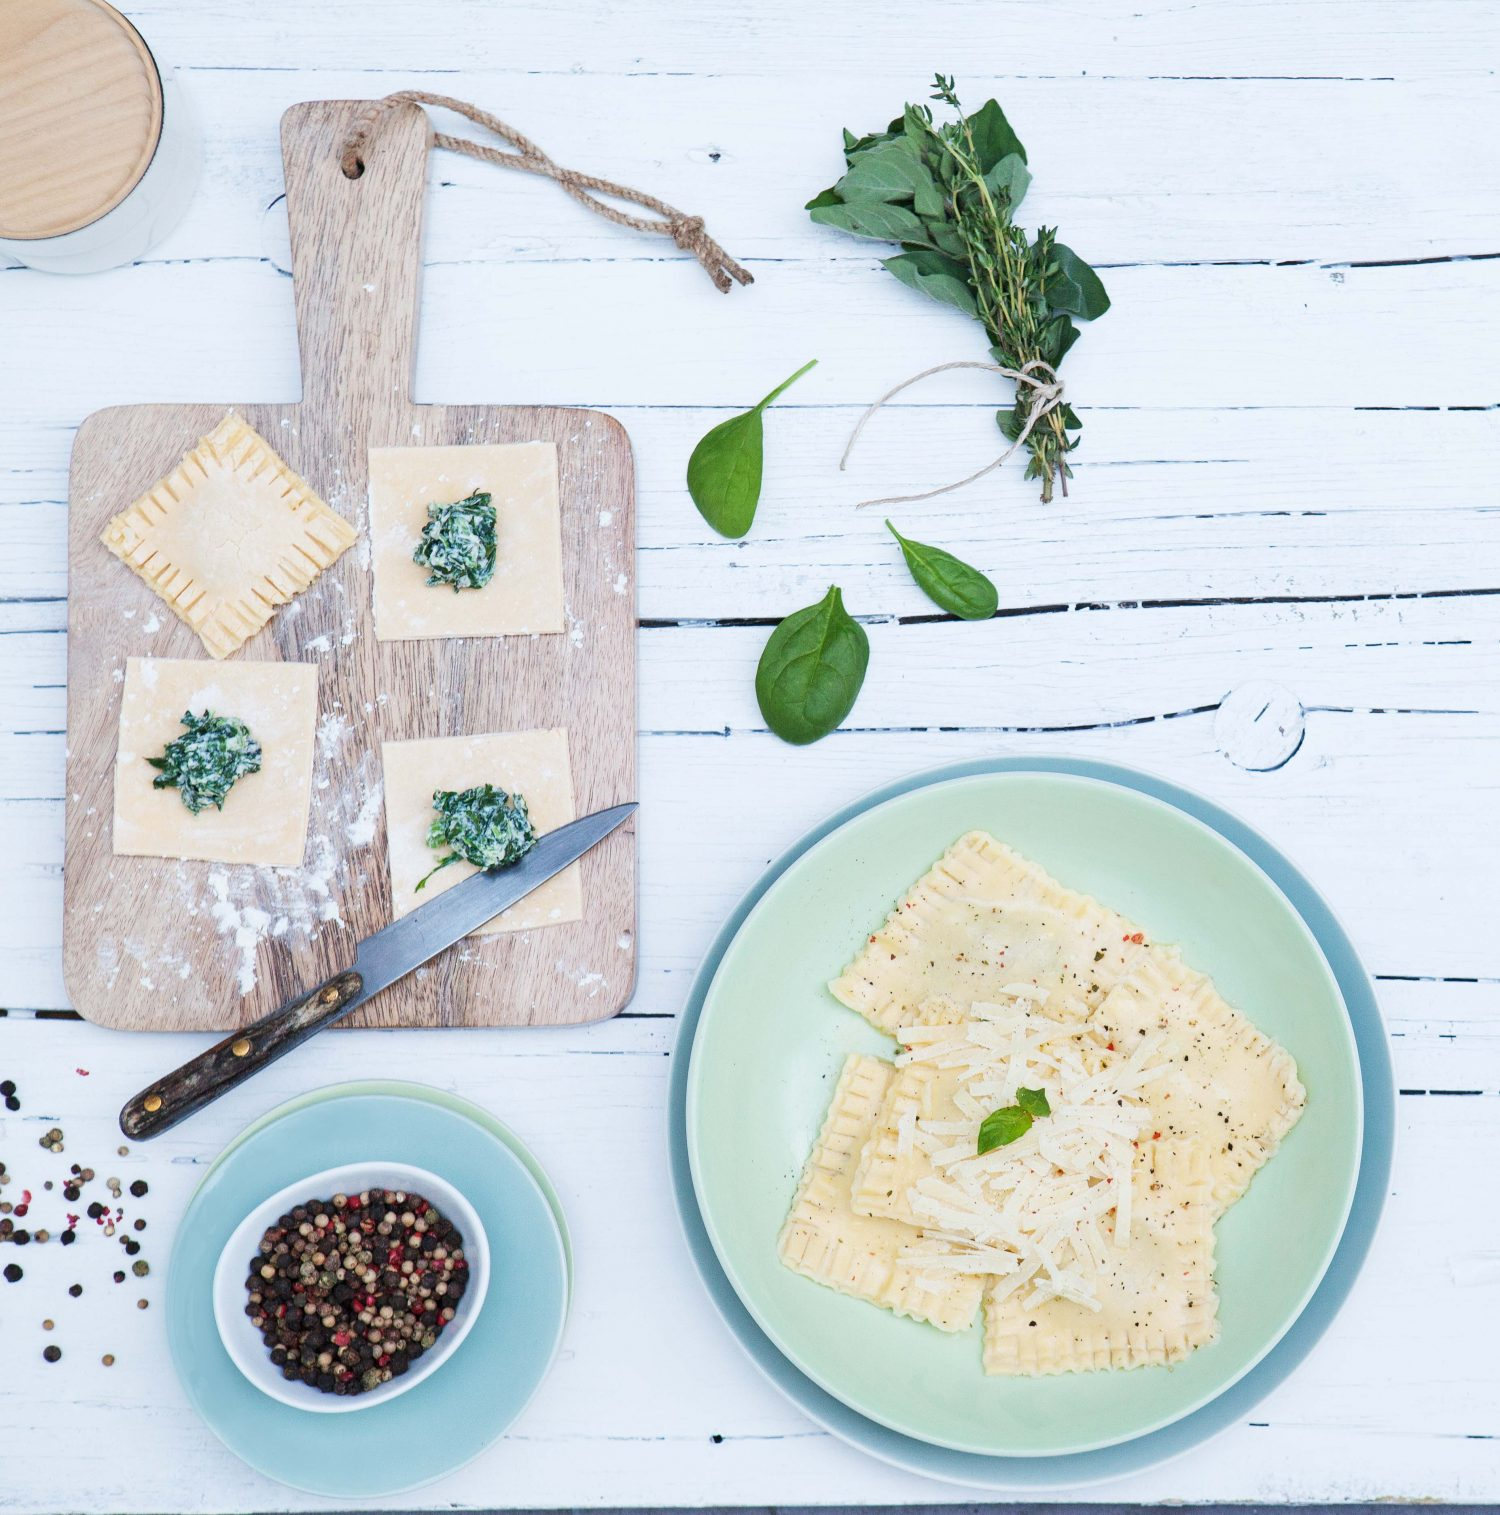 On Coeliac Disease and Gluten-Free Ravioli